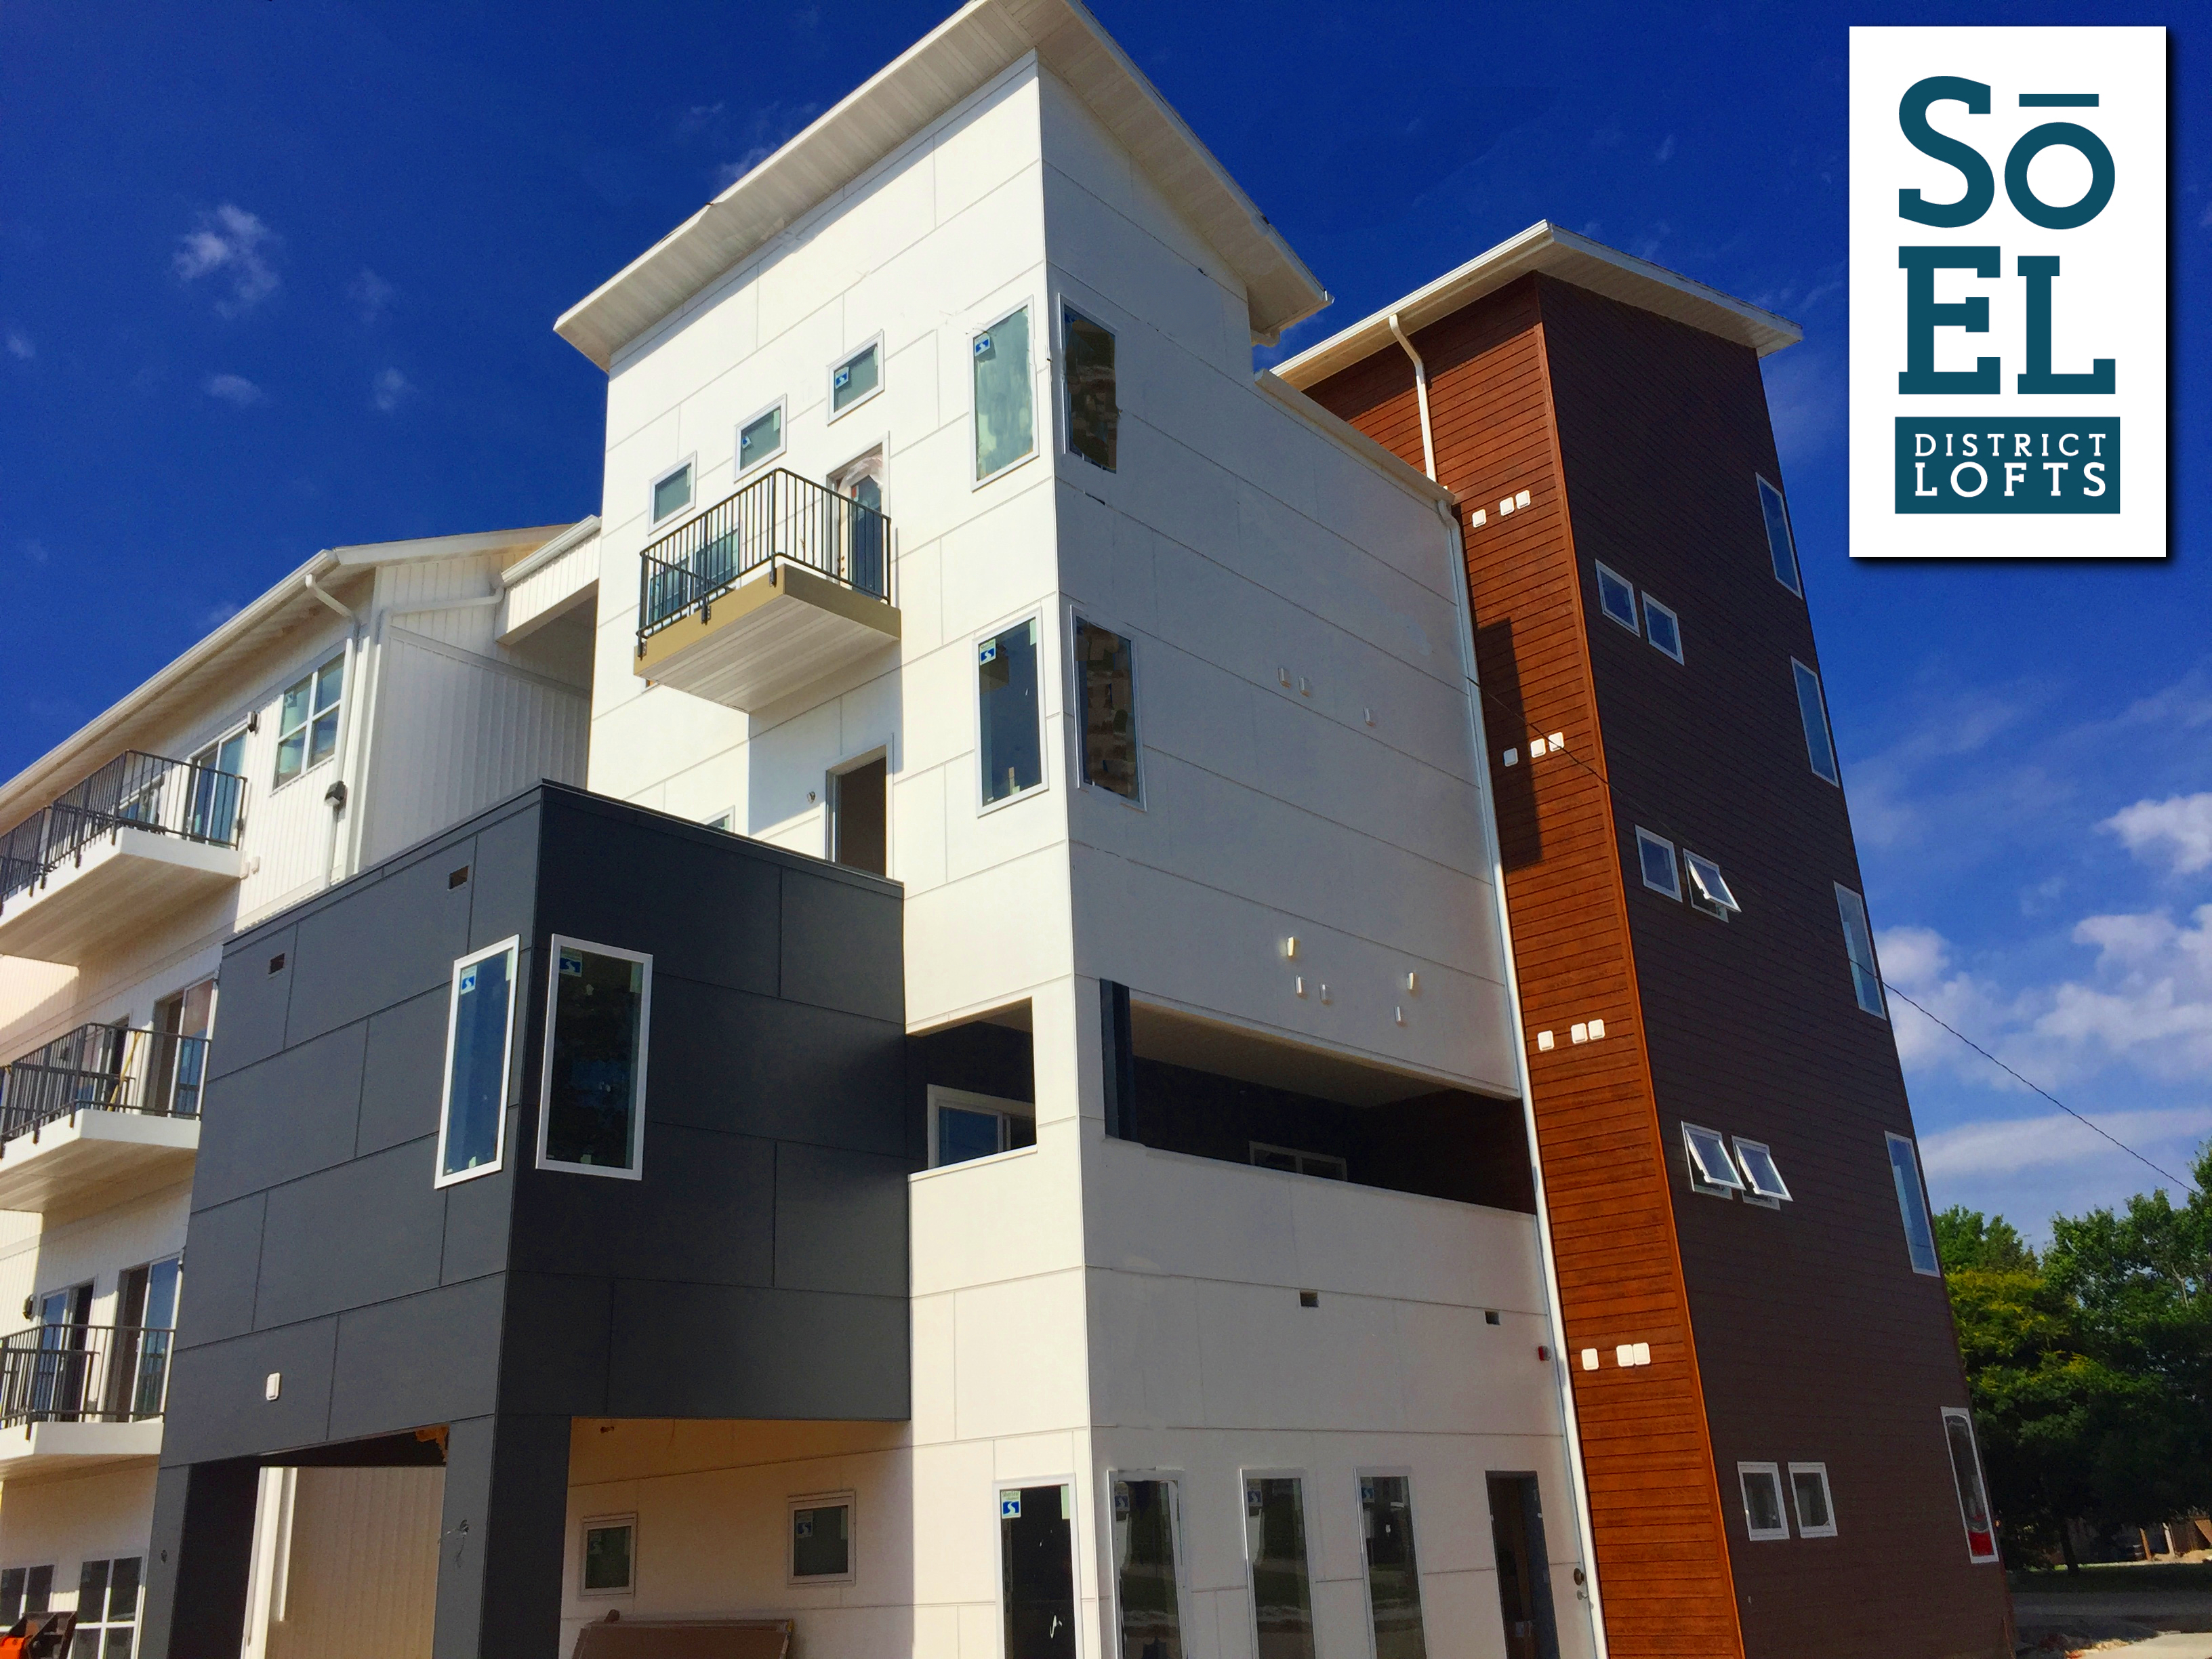 Soel District Lofts